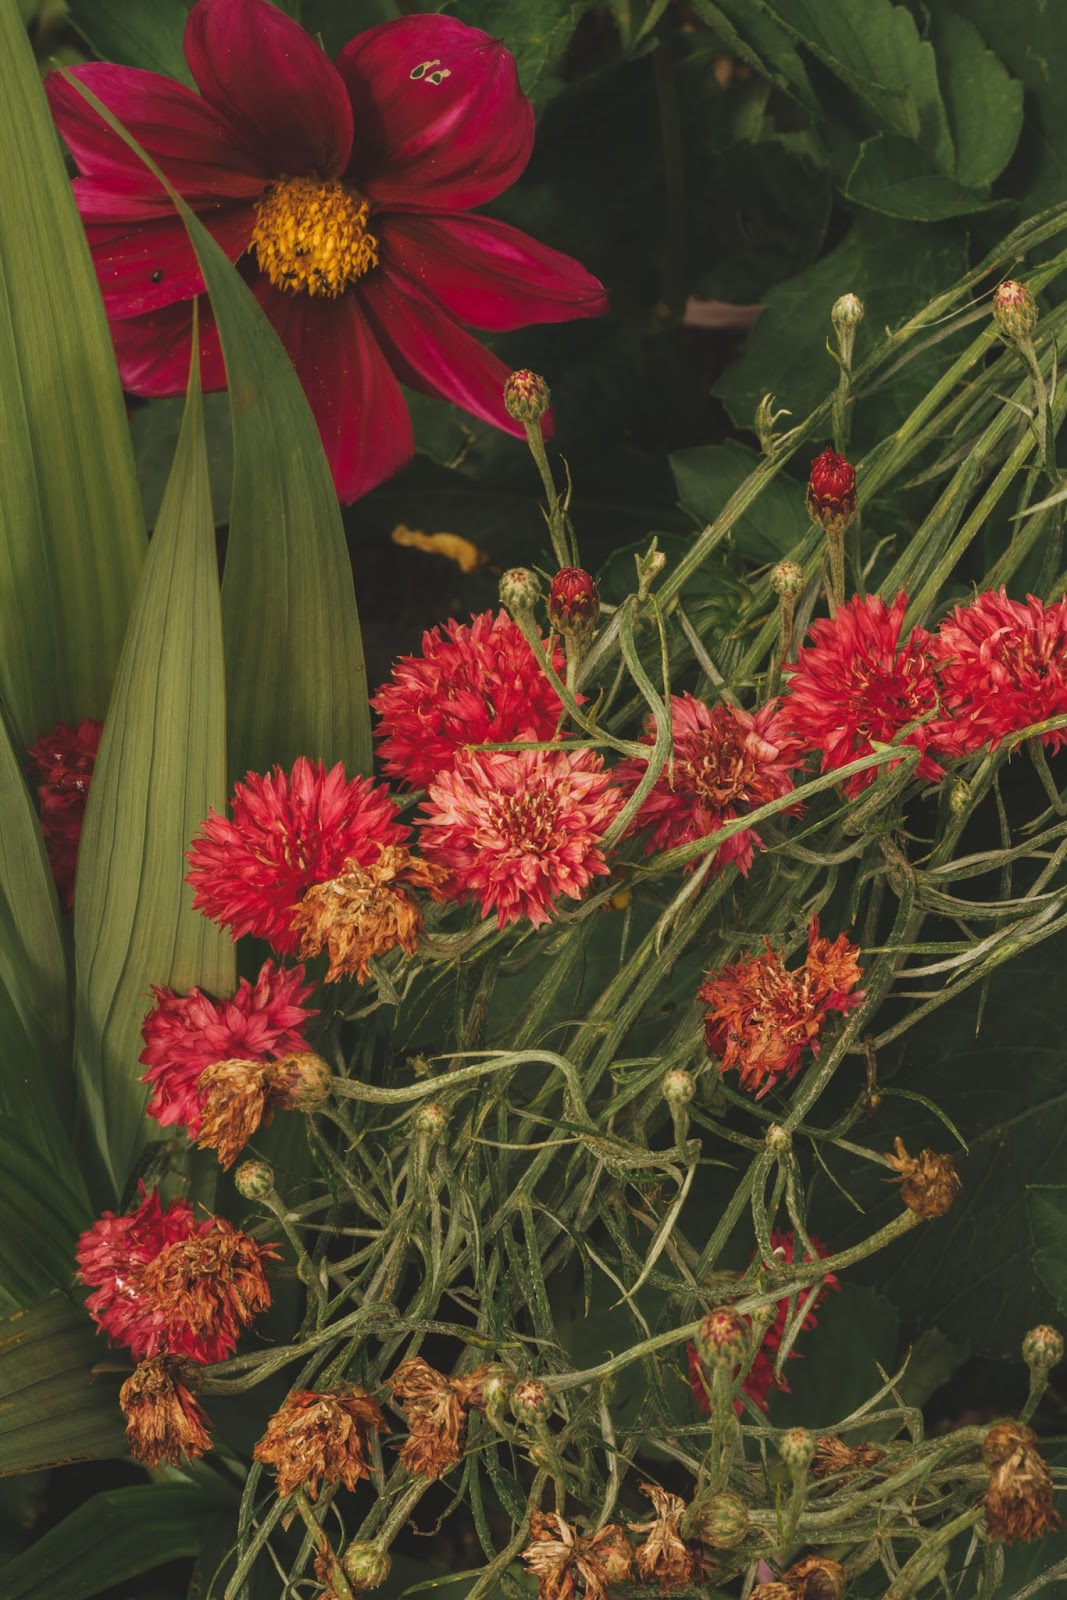 Monet\'s Garden April 8, 2018 | ZsaZsa Bellagio - Like No Other